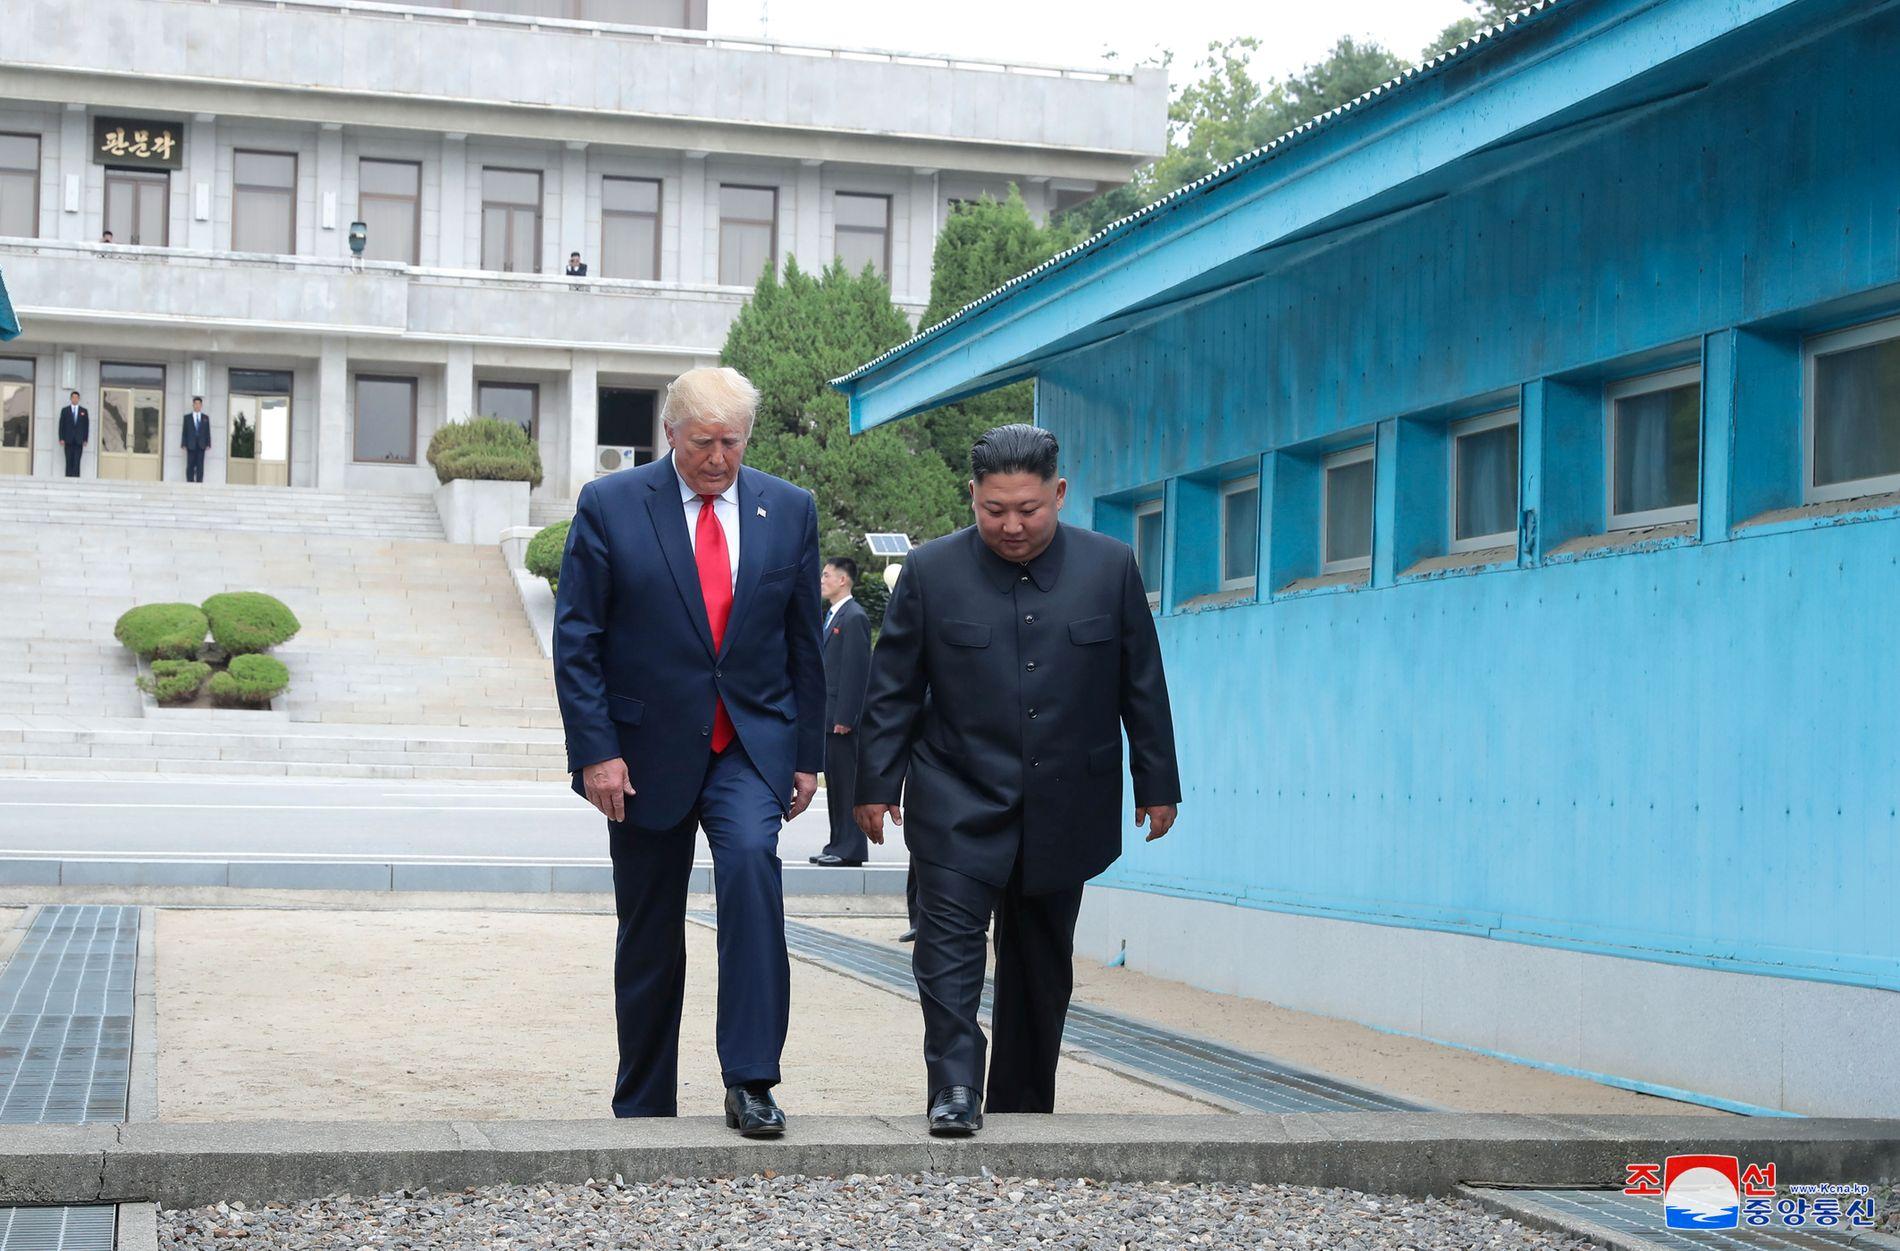 HISTORISK: Søndag tok Donald Trump steget over til Nord-Korea.